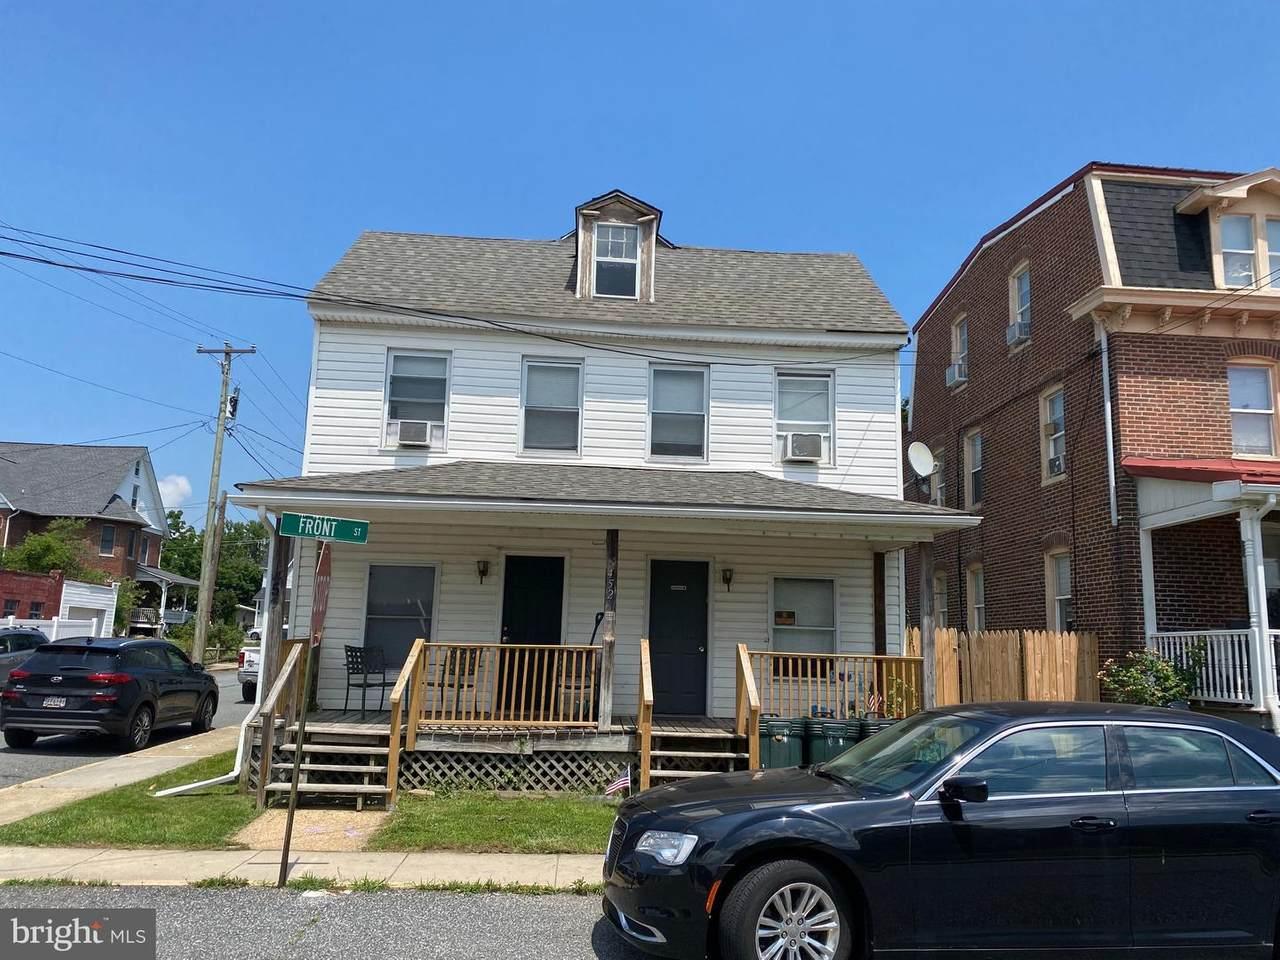 452 Front Street - Photo 1